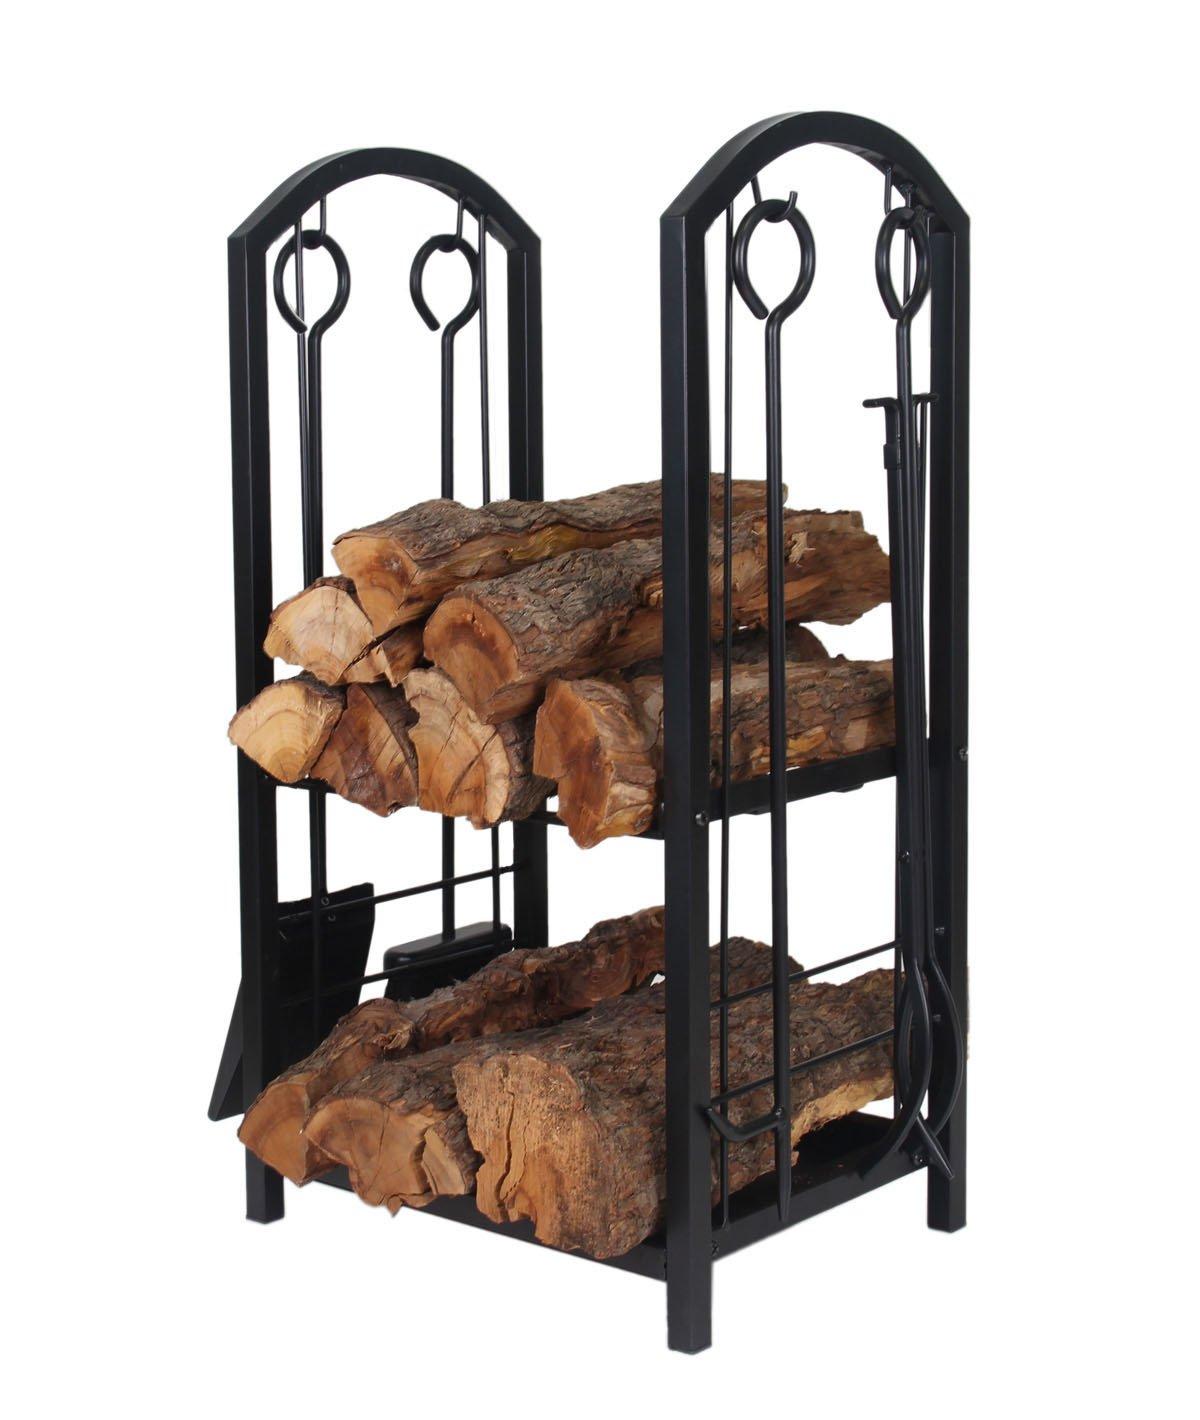 Patio Watcher Deluxe Firewood Rack Log Rack with 4 Tools Firewood Storage Log Holder for Indoor Outdoor Backyard Fireplace, Heavy Duty Steel Black